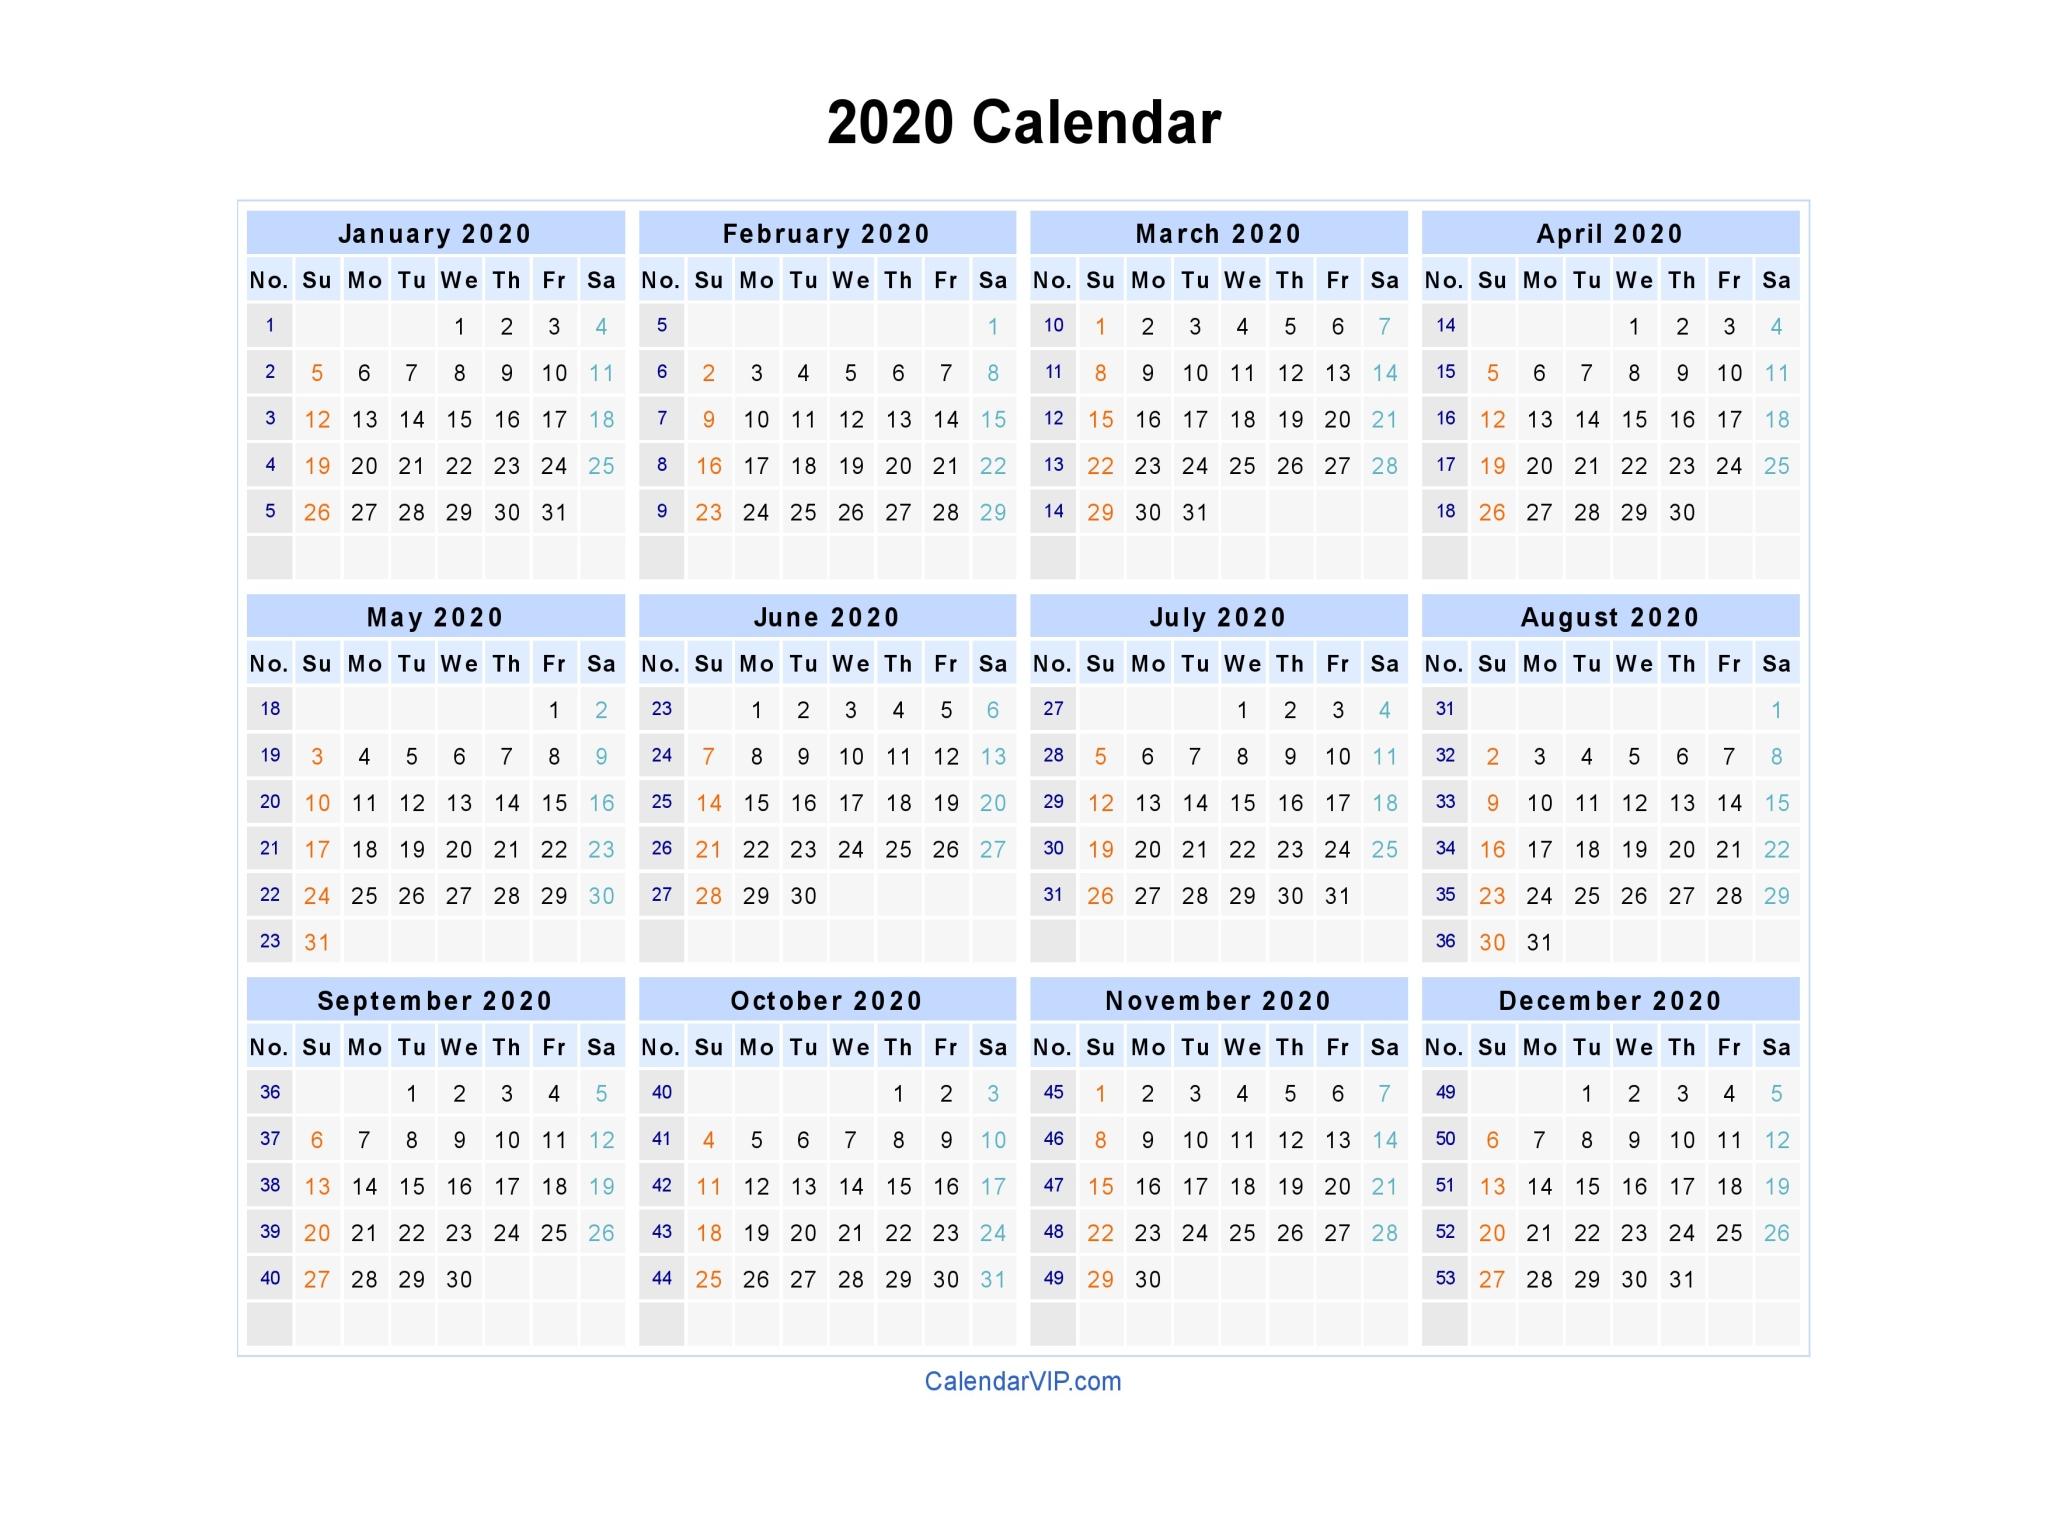 2020 Calendar In Excel Format - Wpa.wpart.co